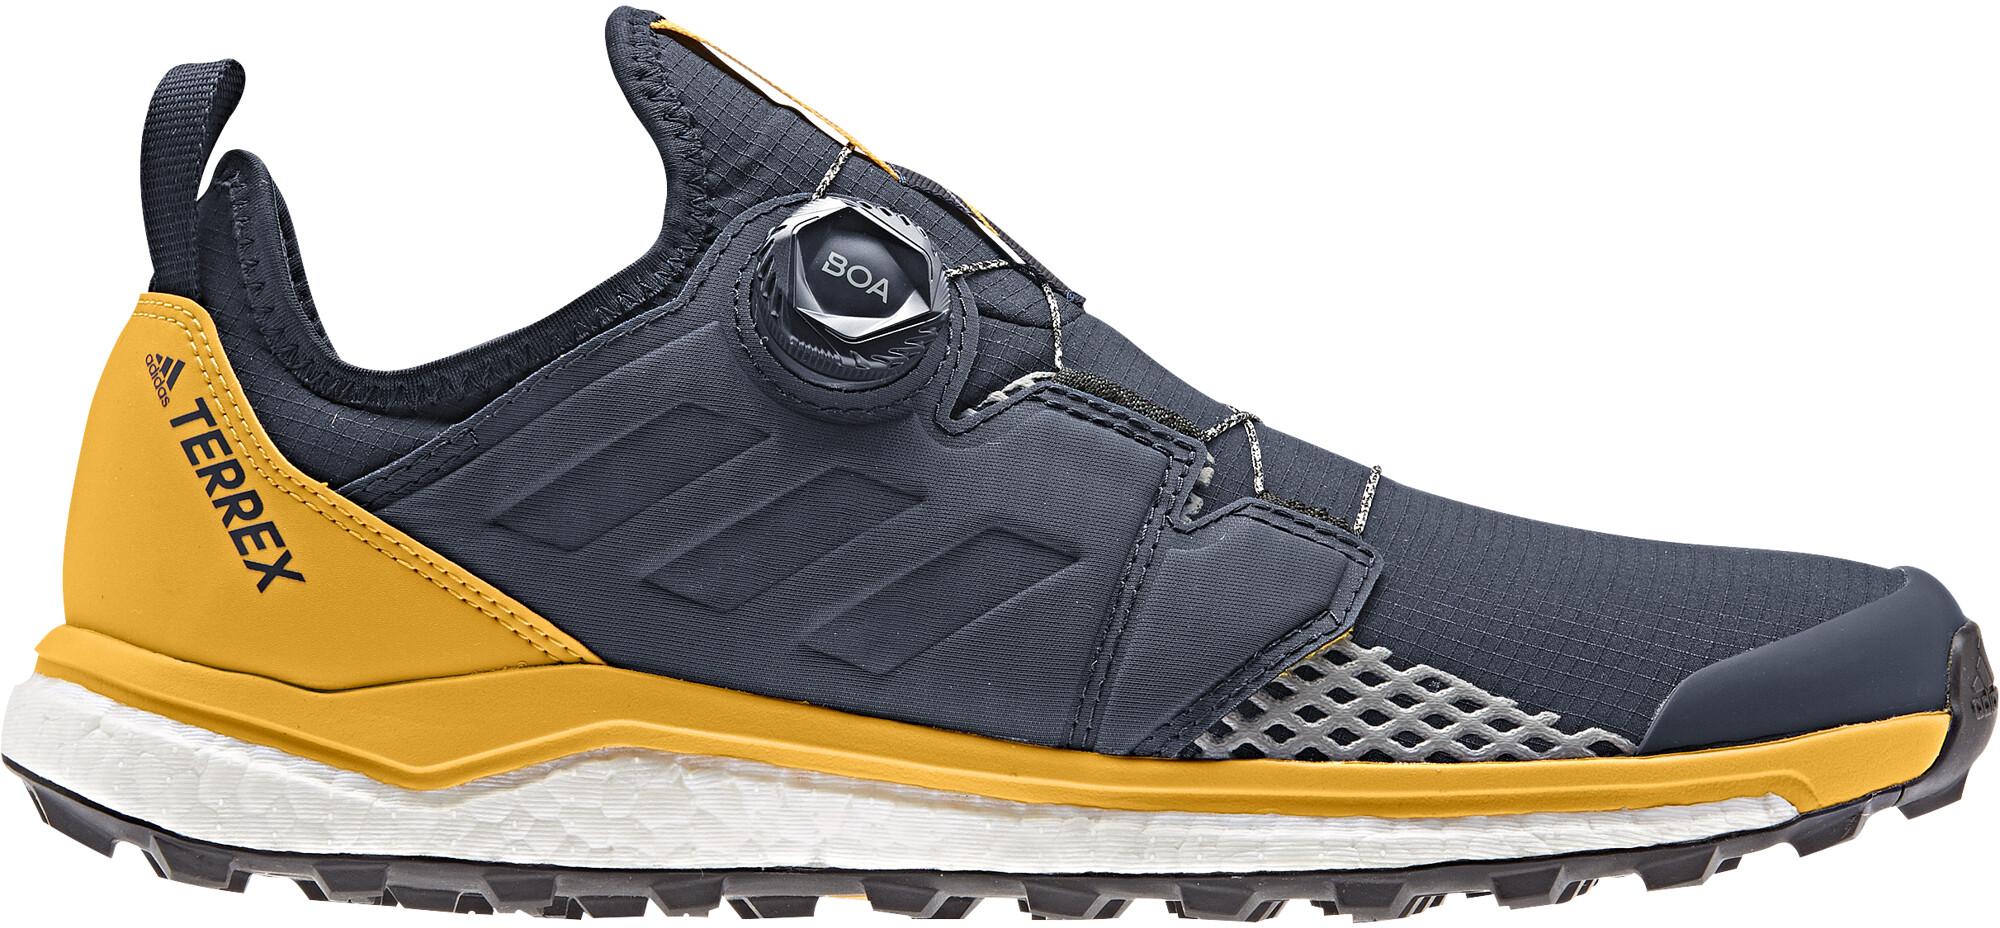 5211d5728d4 adidas TERREX Agravic Boa Shoes Men collegiate navy/collegiate navy/active  gold